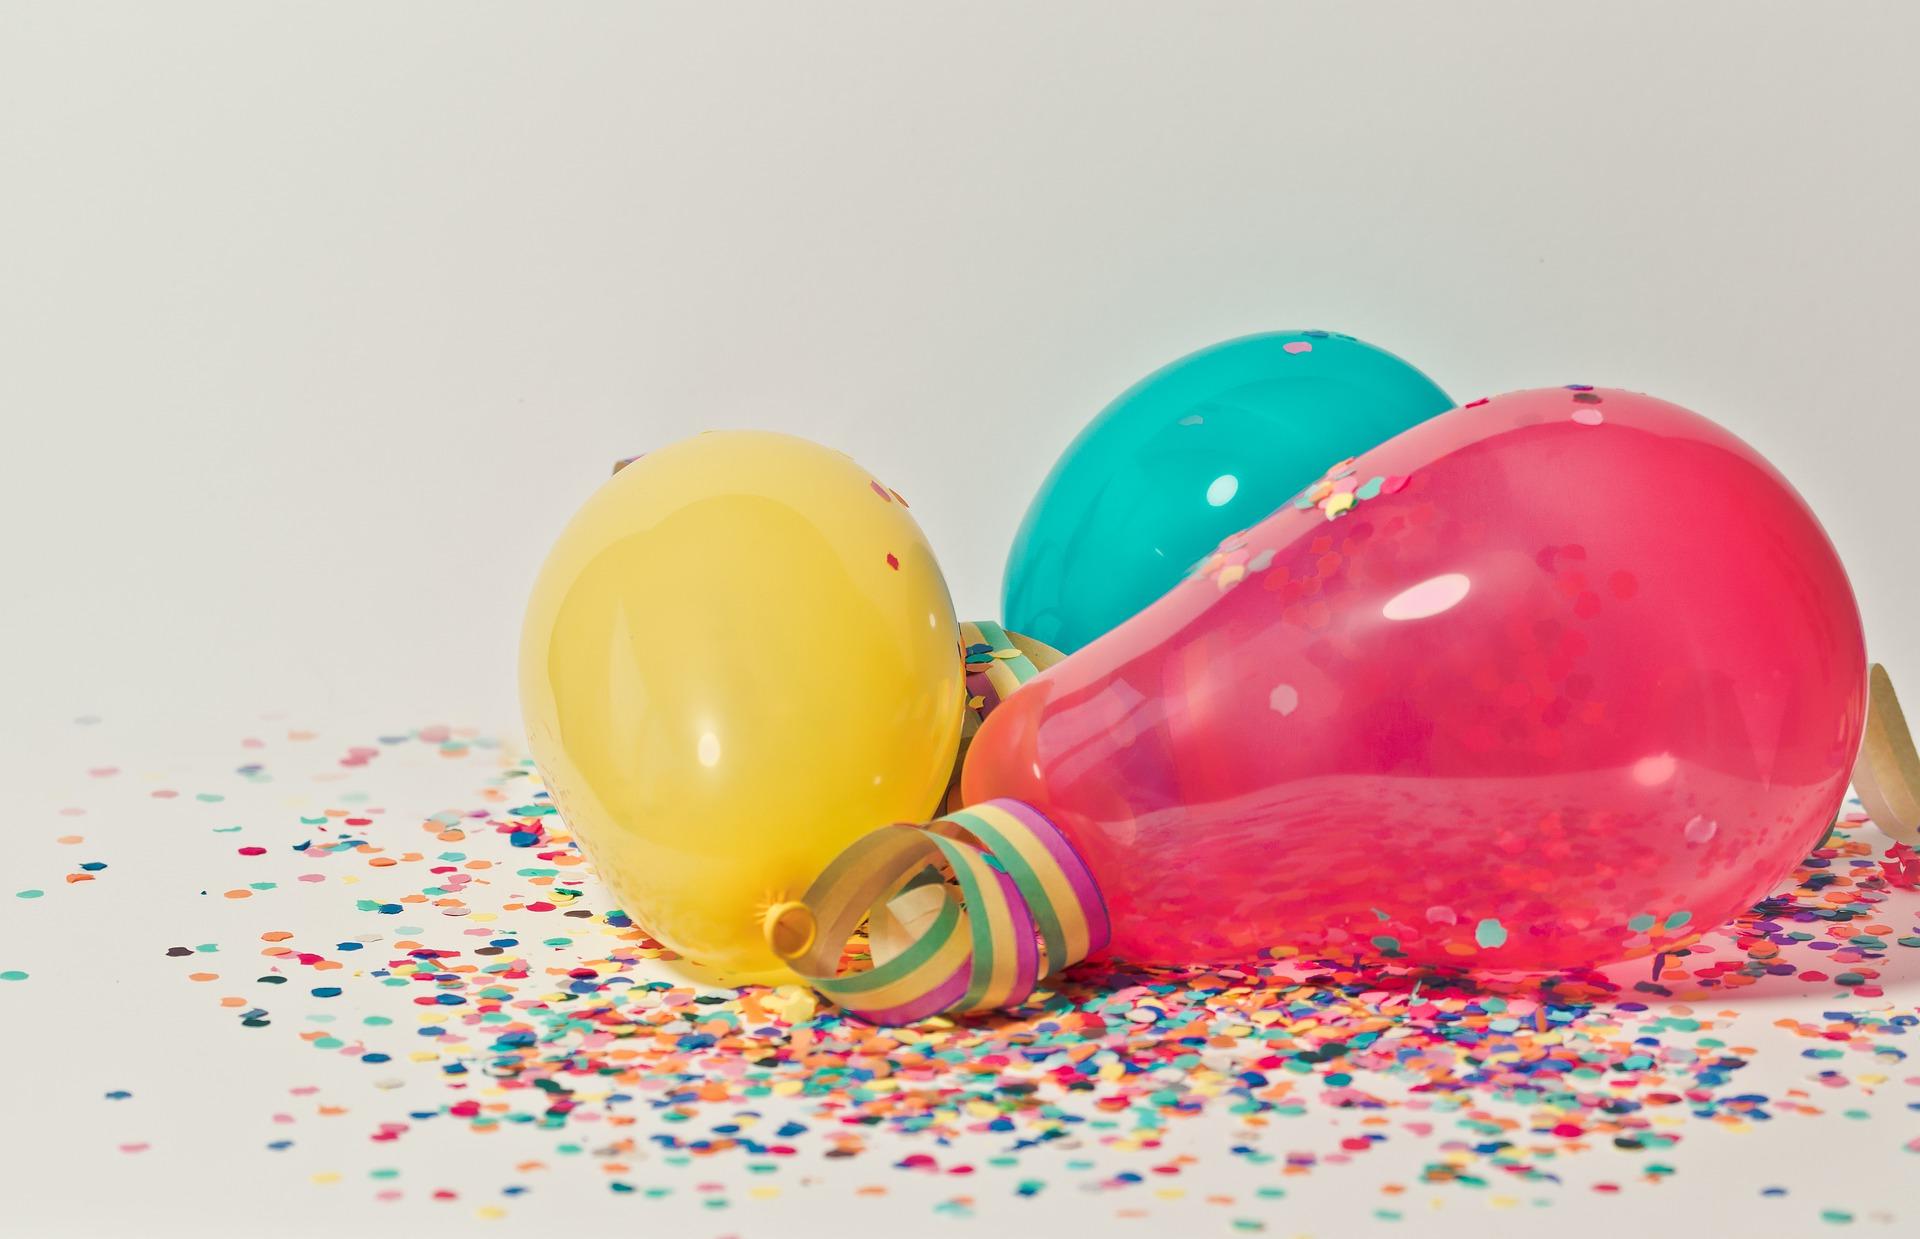 Balony leżące na konfetti